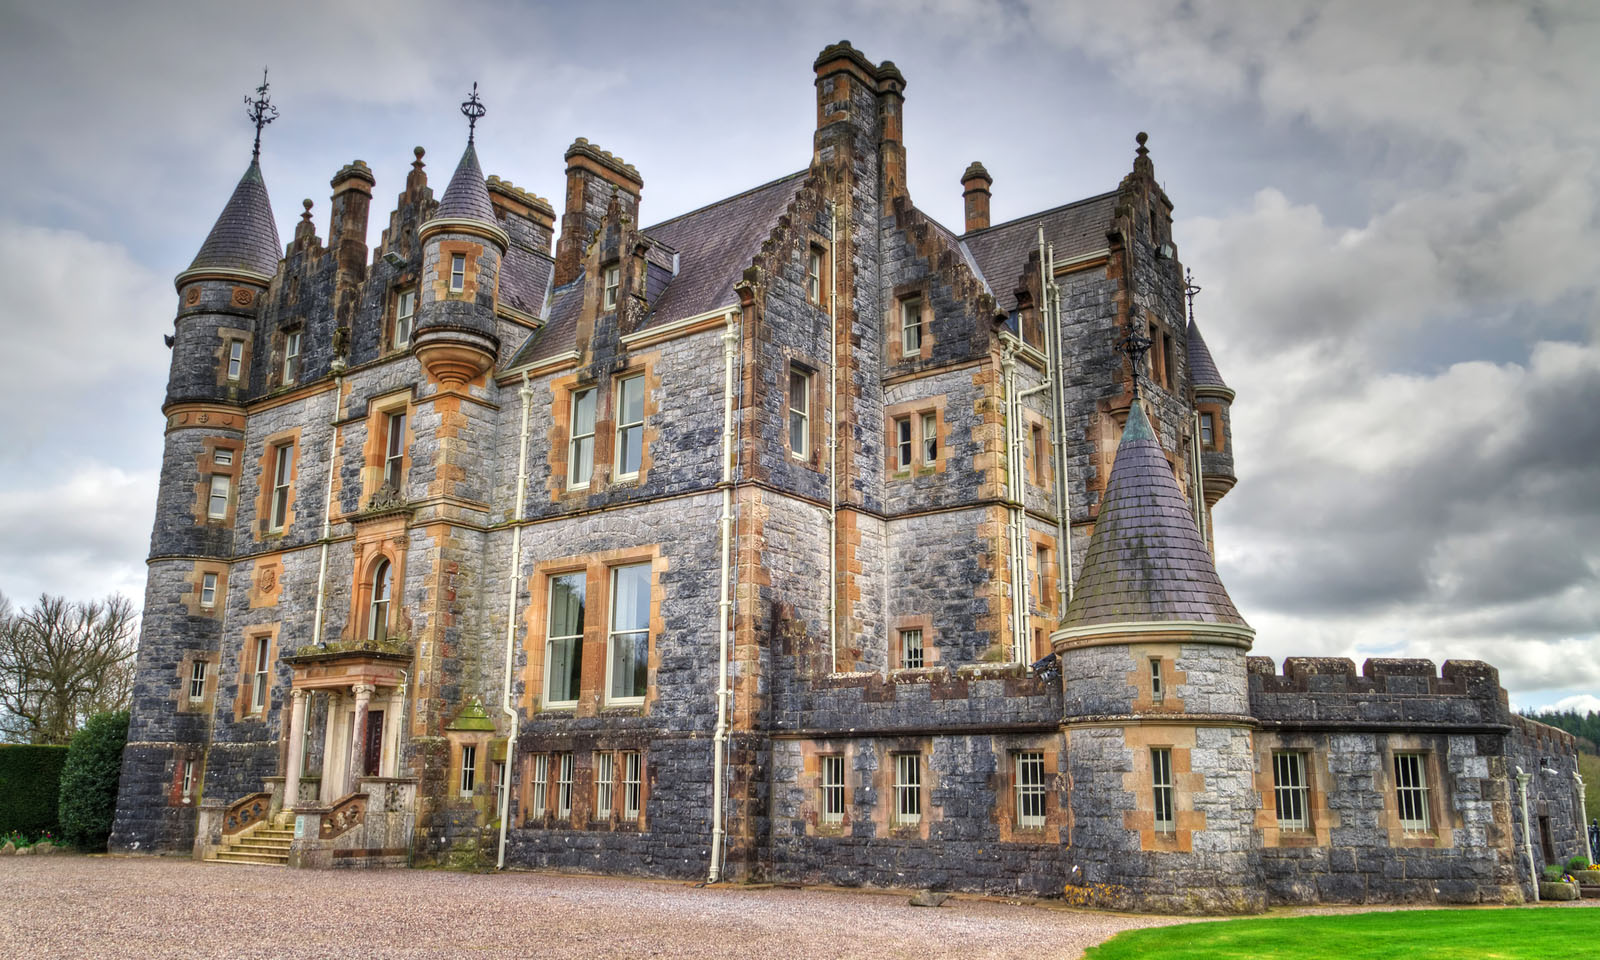 Top 3 Most Beautiful Castles in Ireland